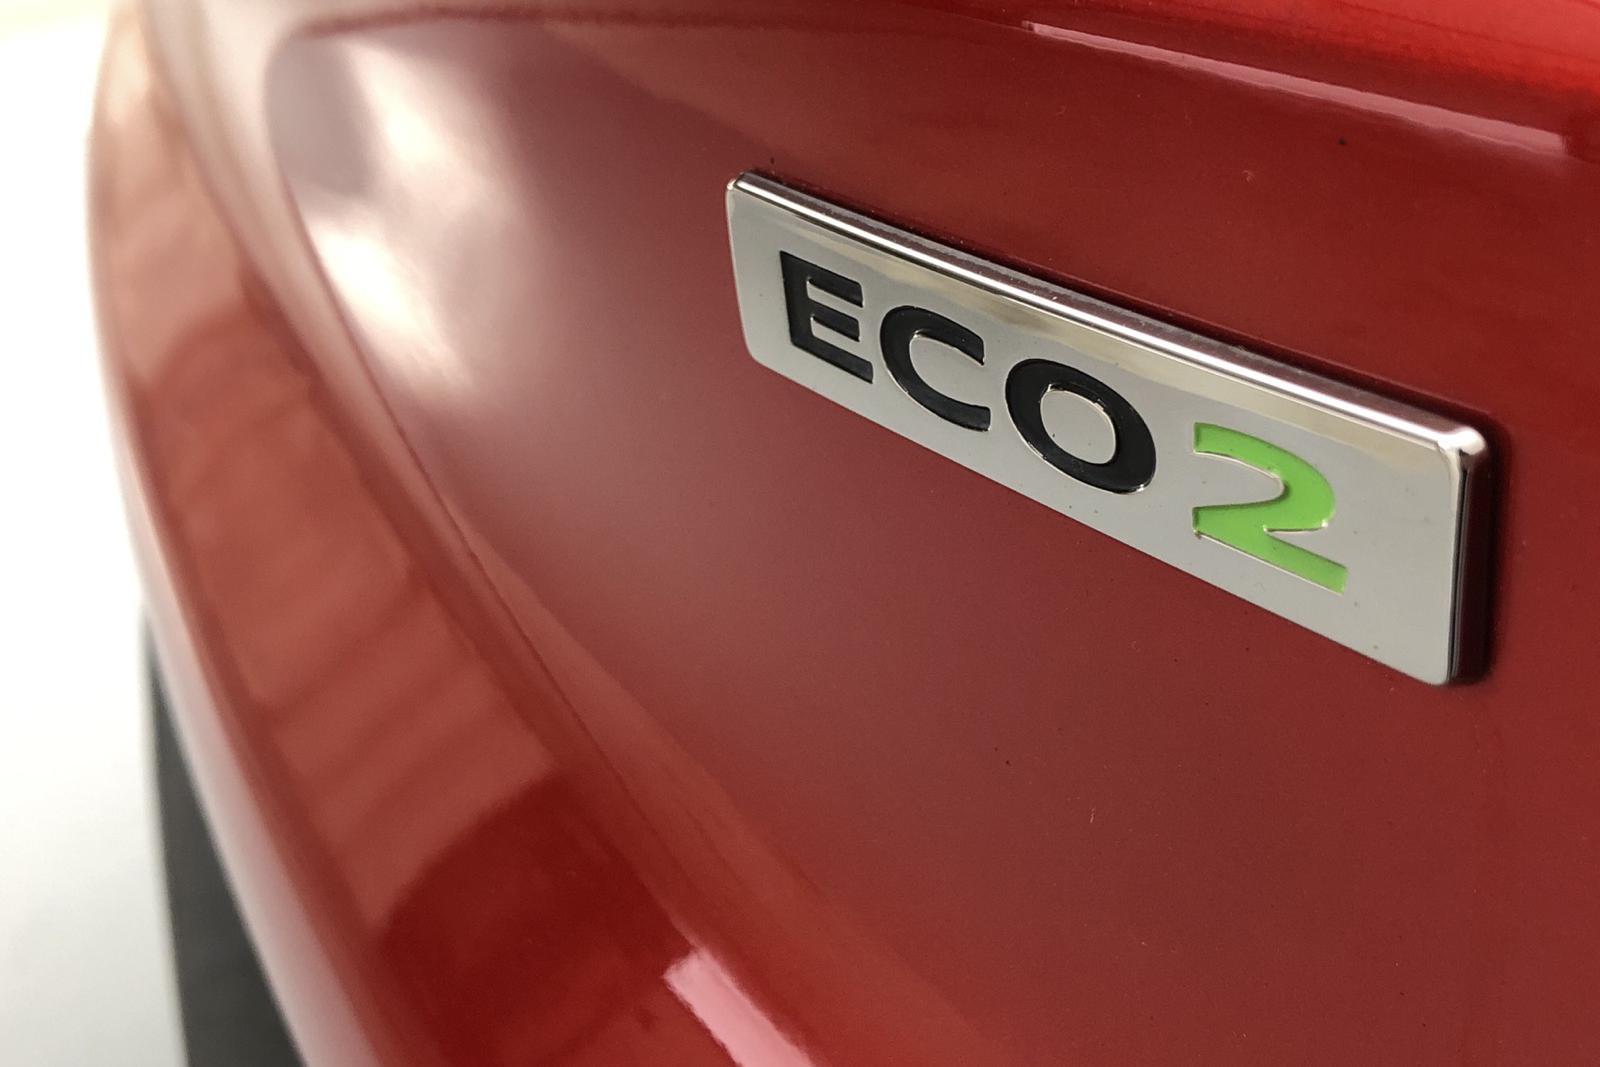 Renault Kadjar 1.5 dCi (110hk) - 155 860 km - Automatic - red - 2016